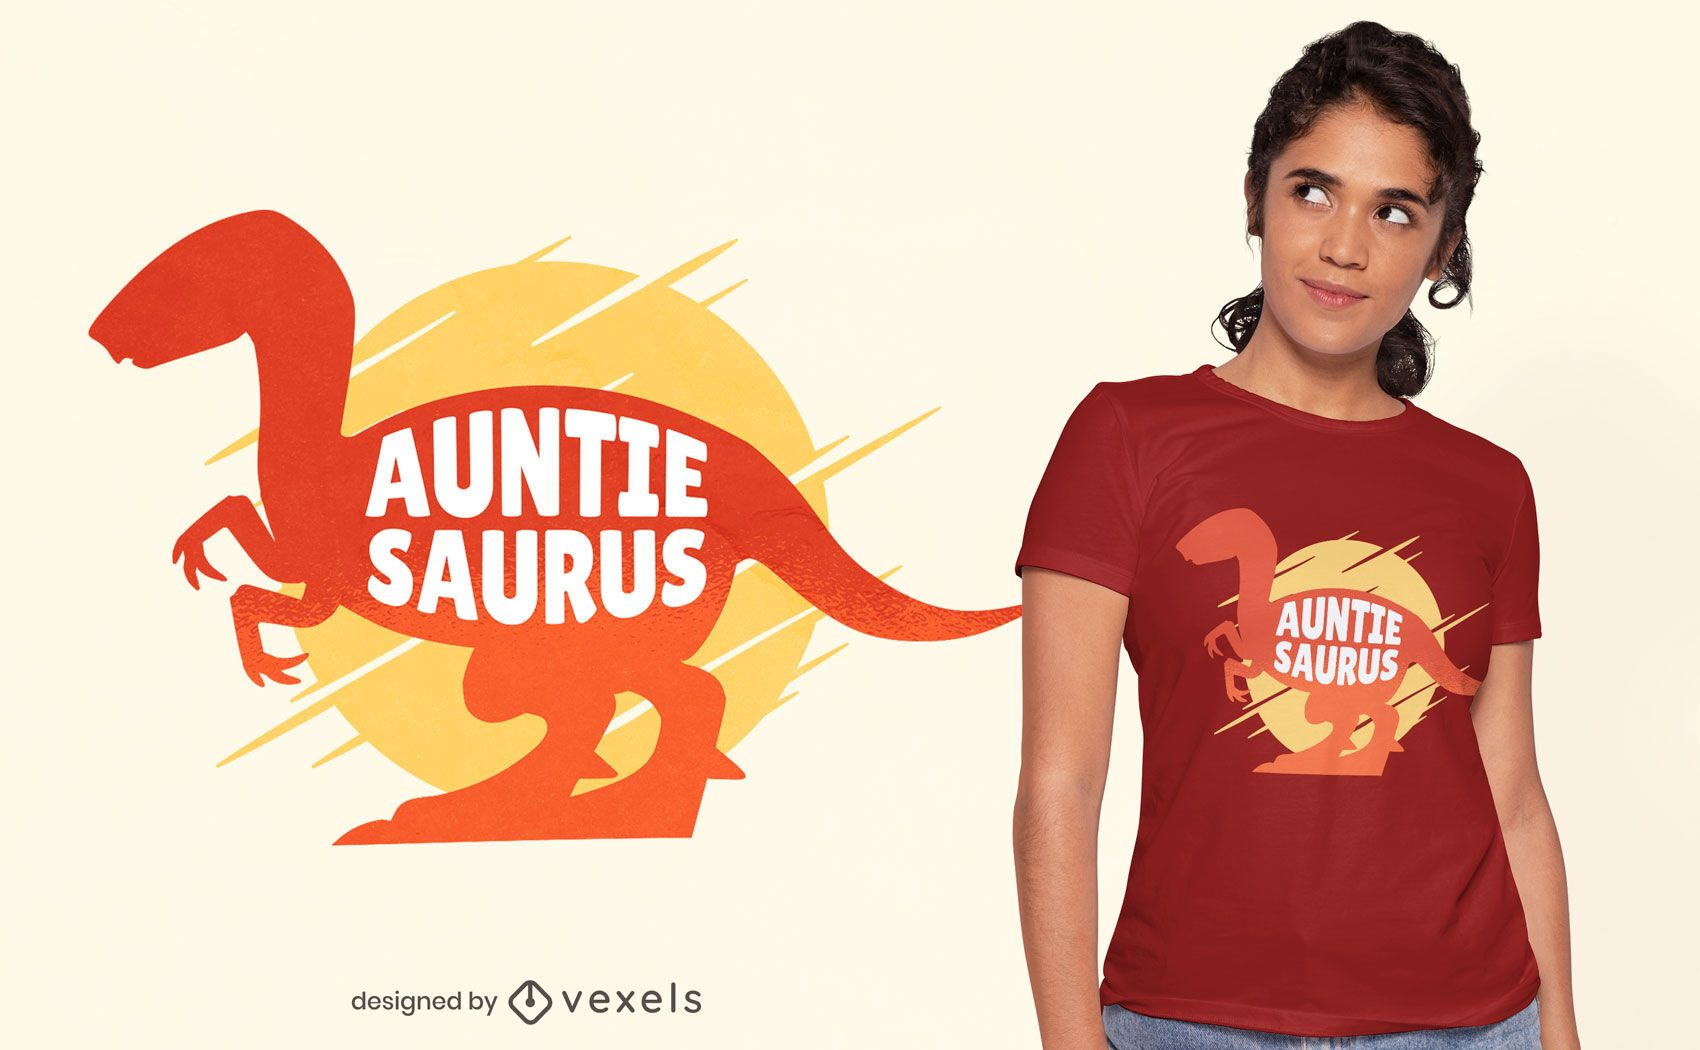 Auntie saurus t-shirt design